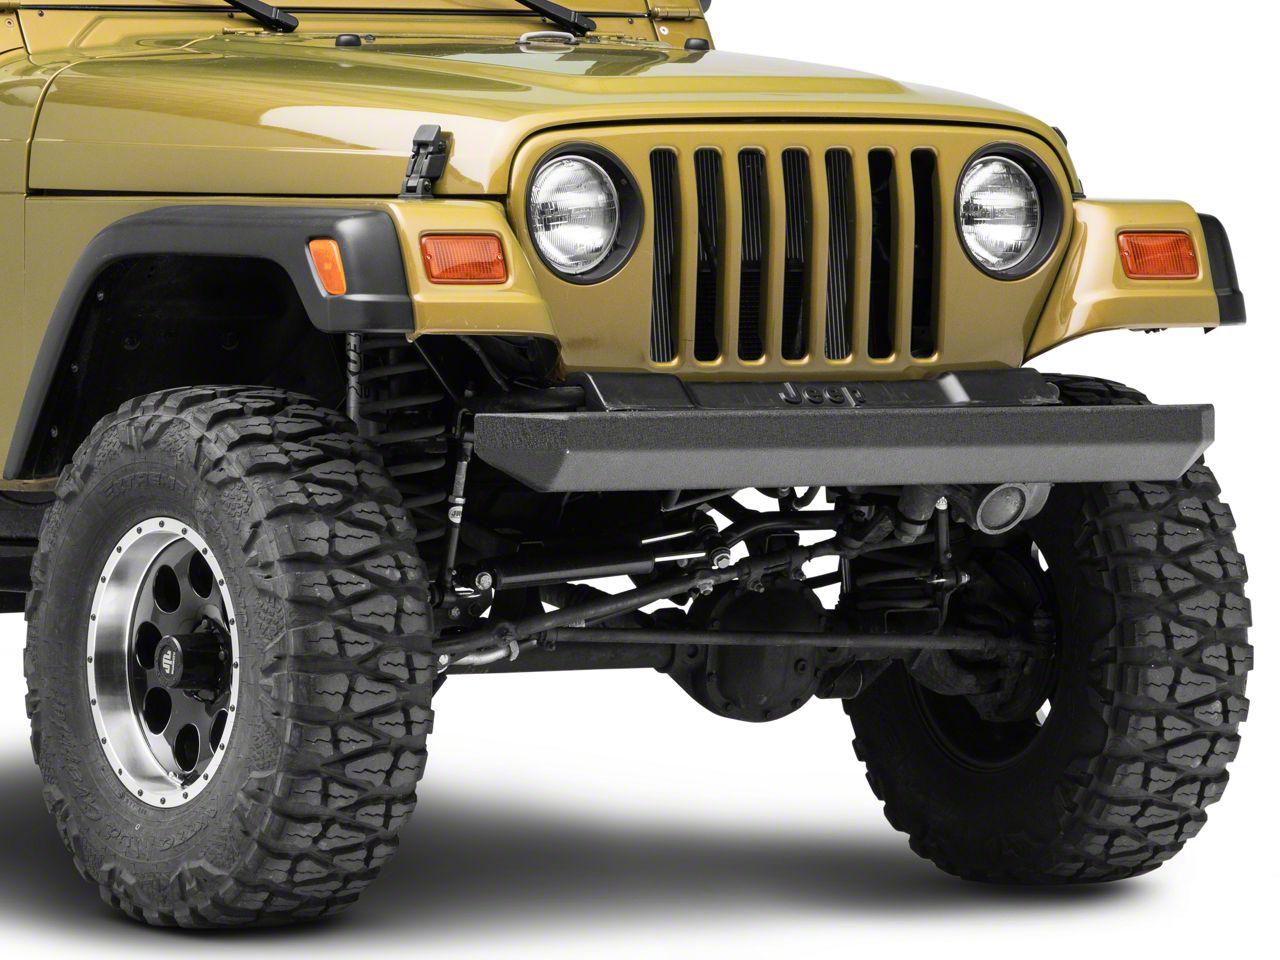 Add Smittybilt SRC Rock Crawler Classic Front Bumper (87-06 Wrangler YJ & TJ)